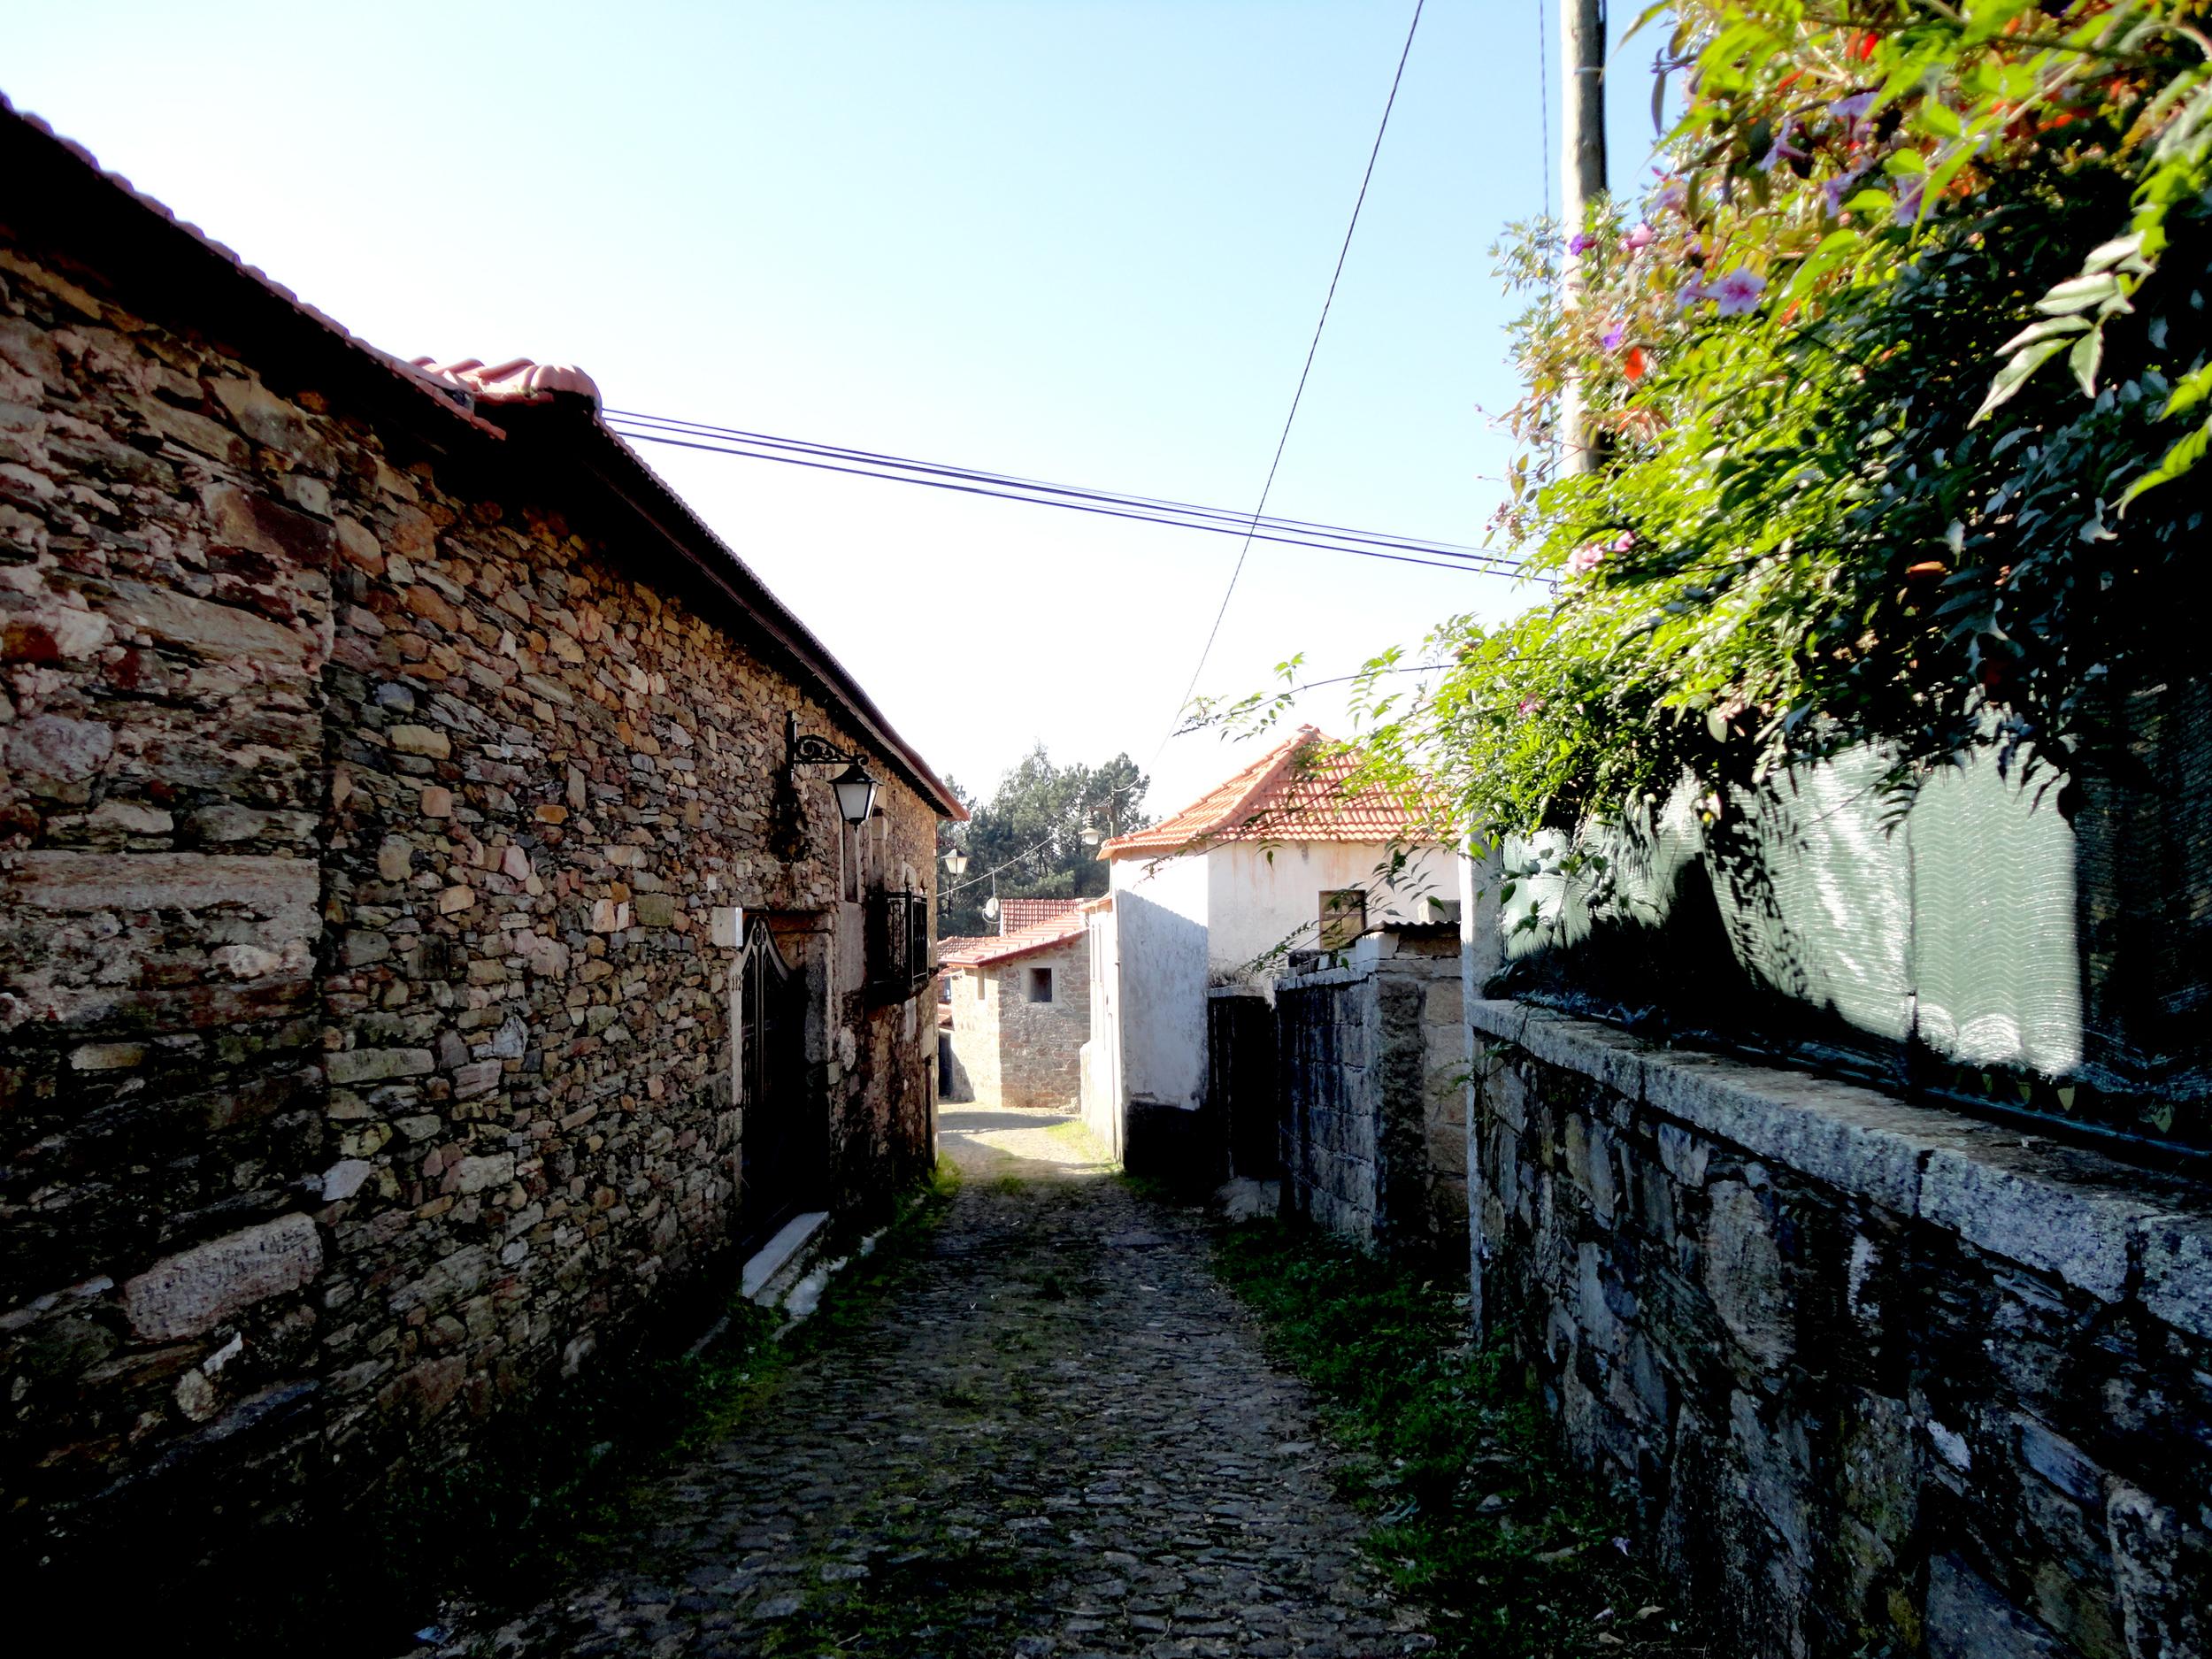 rua josé varanda, 350 - lourizela, préstimo, aveiro.